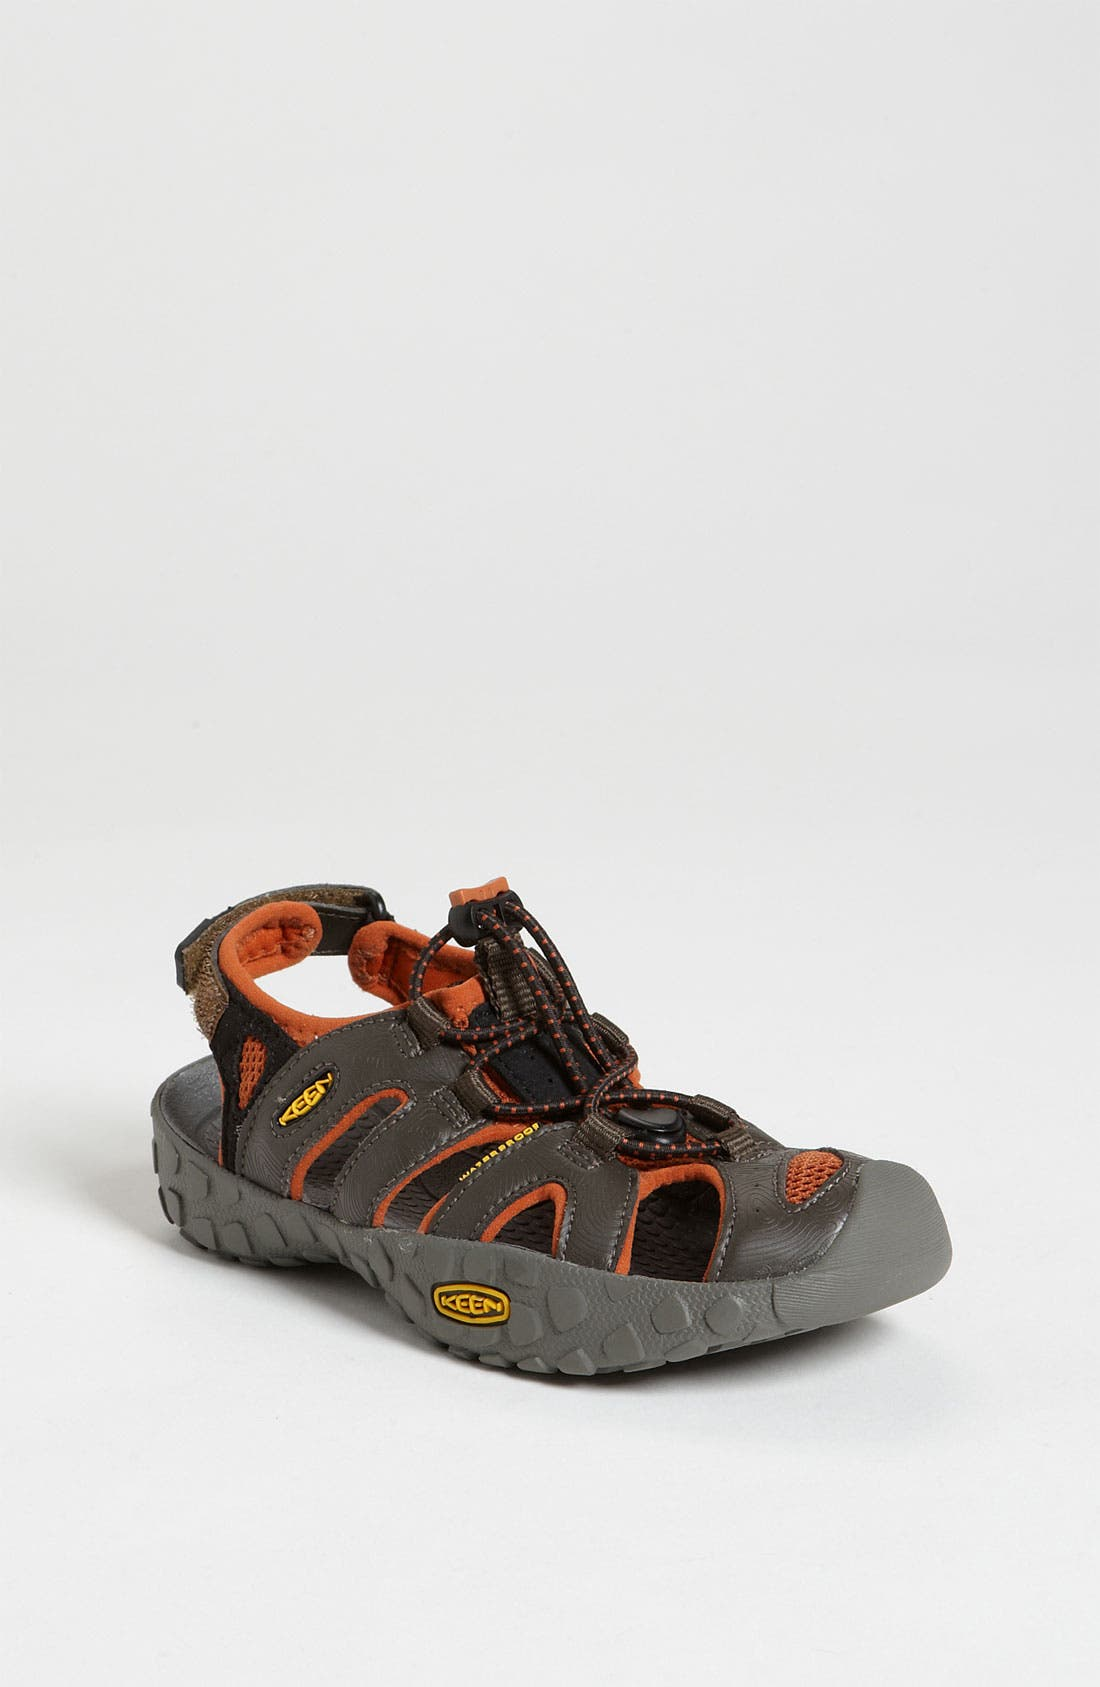 Alternate Image 1 Selected - Keen 'Kupa' Sandal (Toddler, Little Kid & Big Kid)